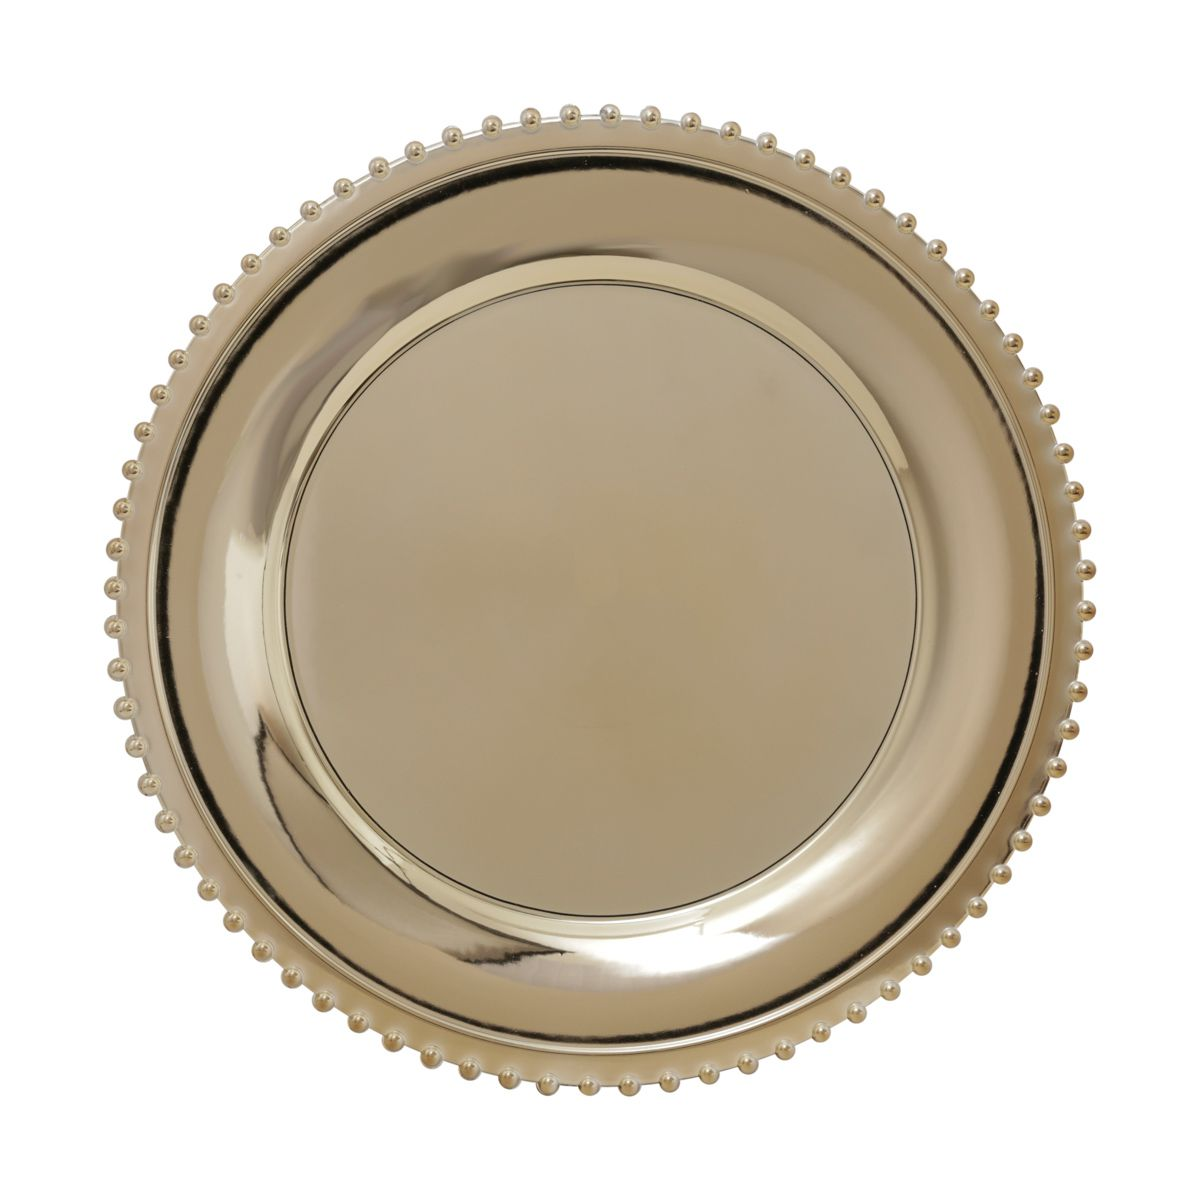 Jogo 6 peças Sousplat 33 cm de plástico dourado Balls Lyor - L4301